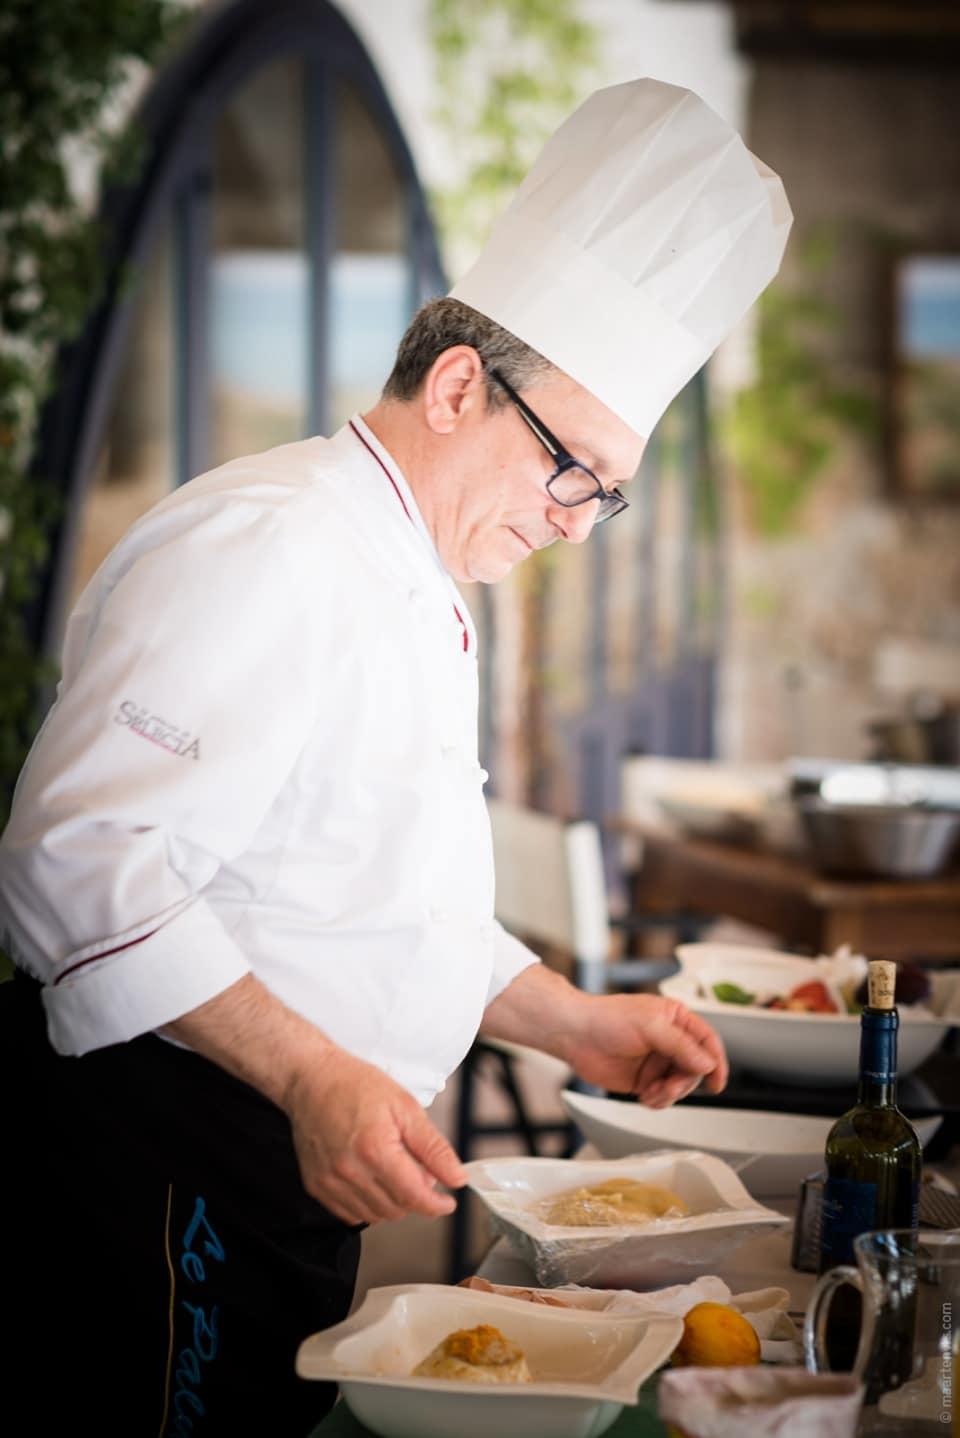 20140530 1074 960x1438 - Italian Cooking Class